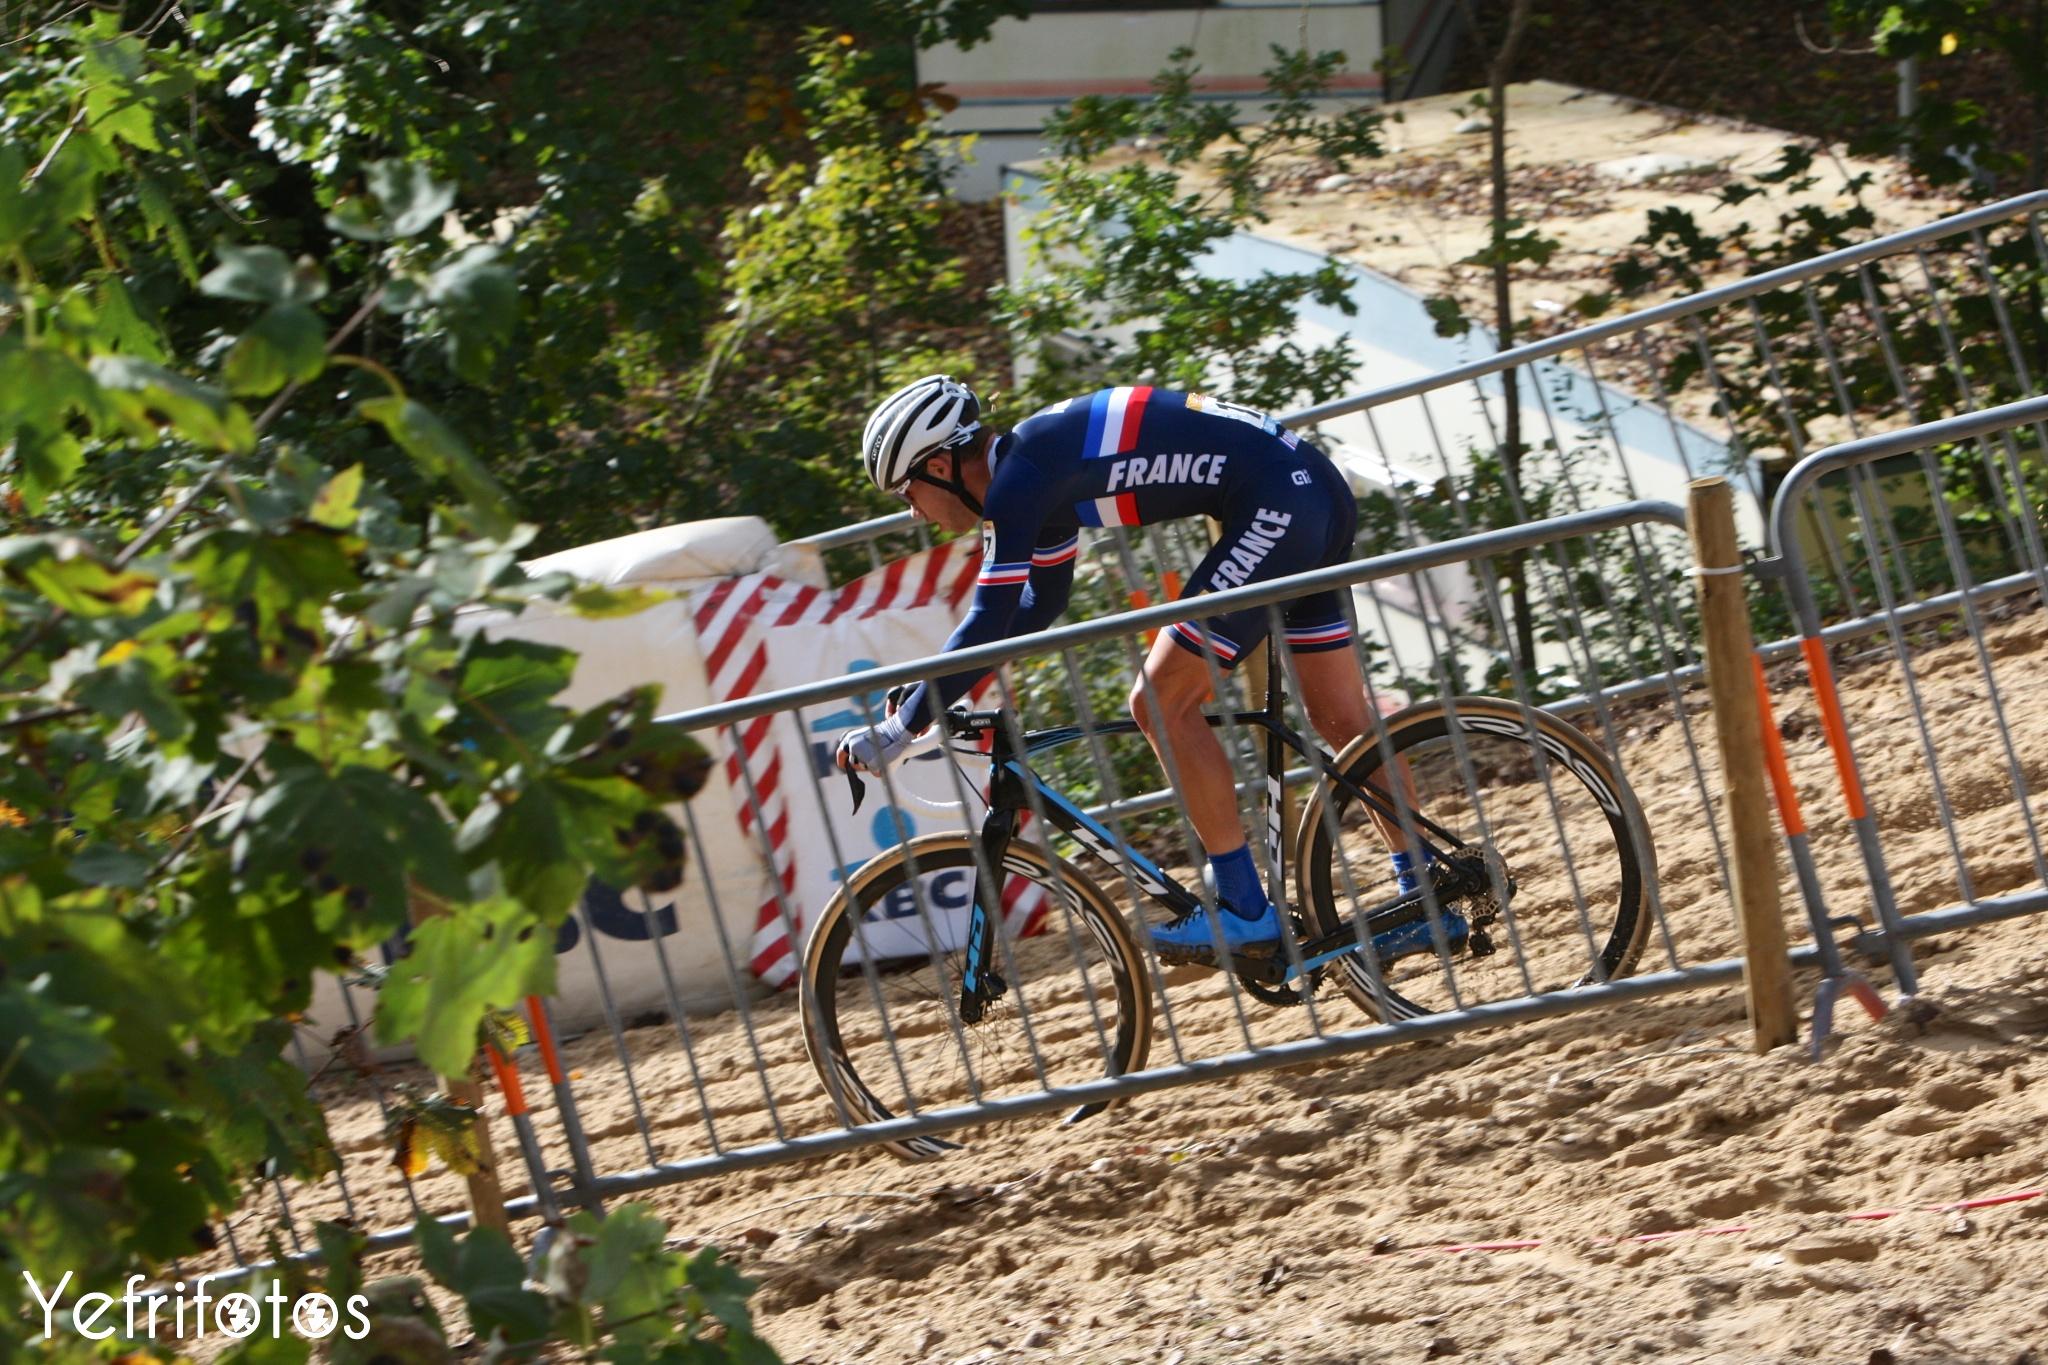 Koksijde - UCI Cyclocross World Cup - Lucas Dubau